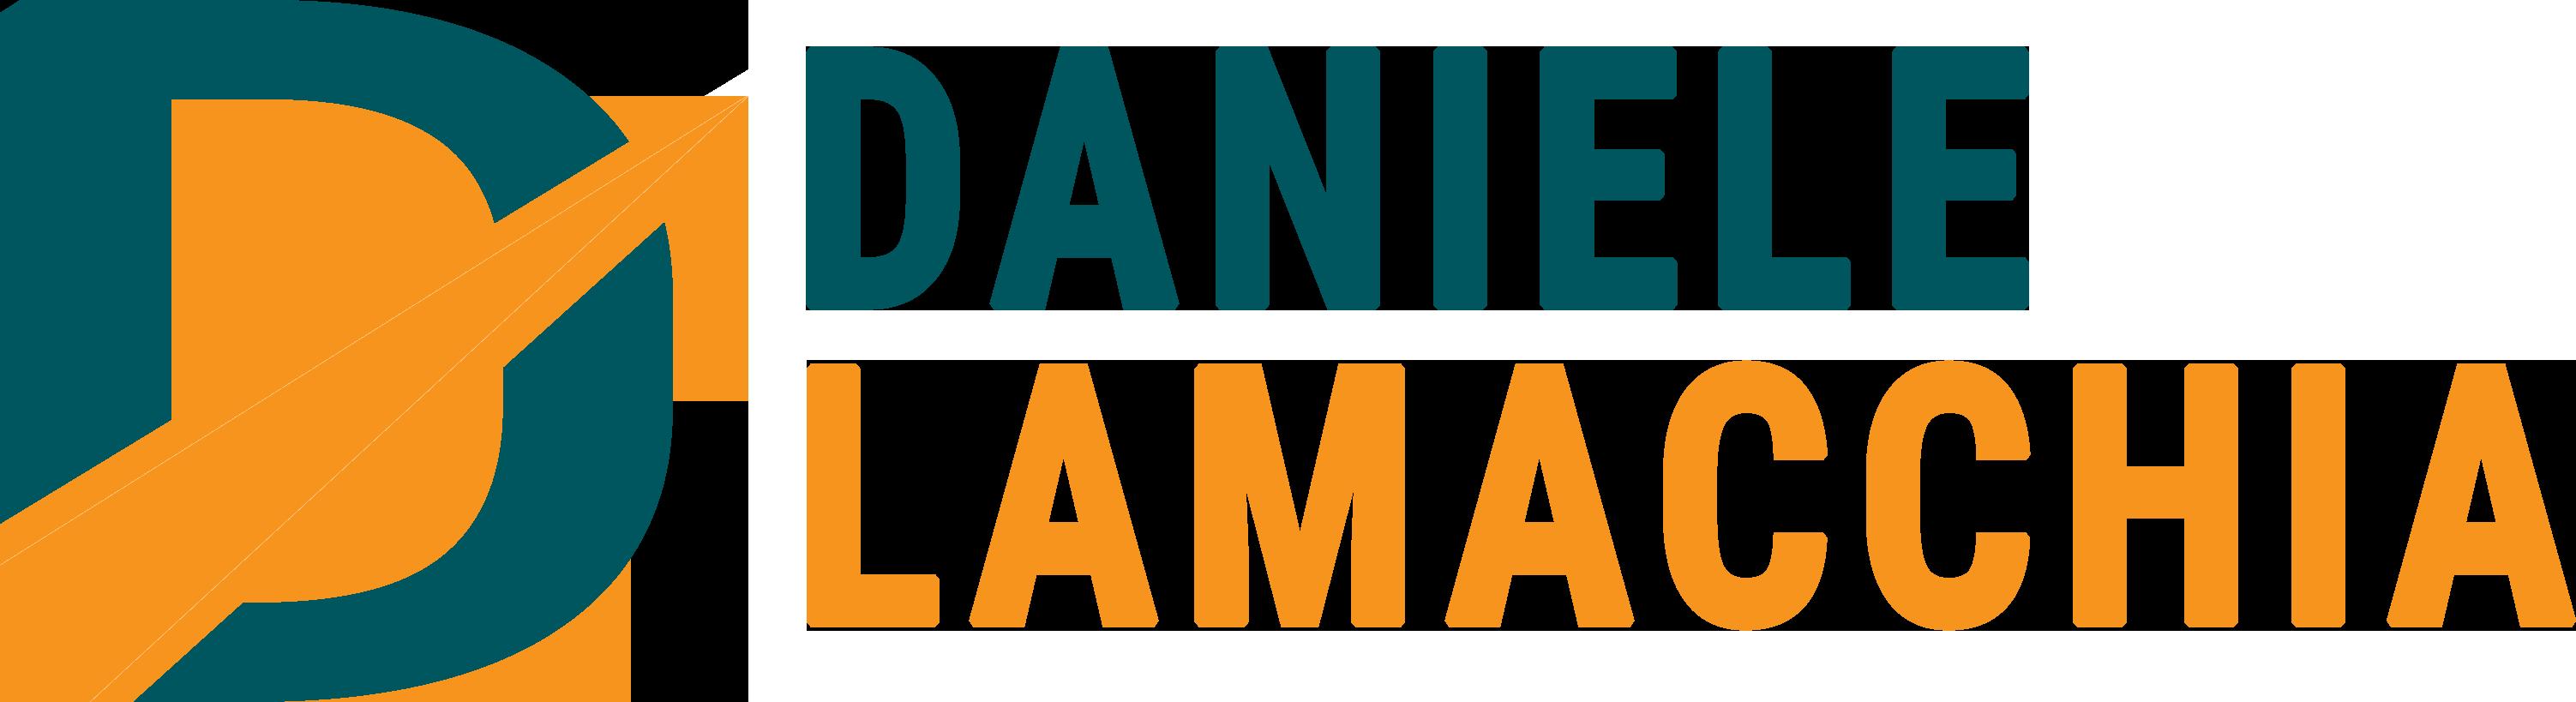 Daniele Lamacchia